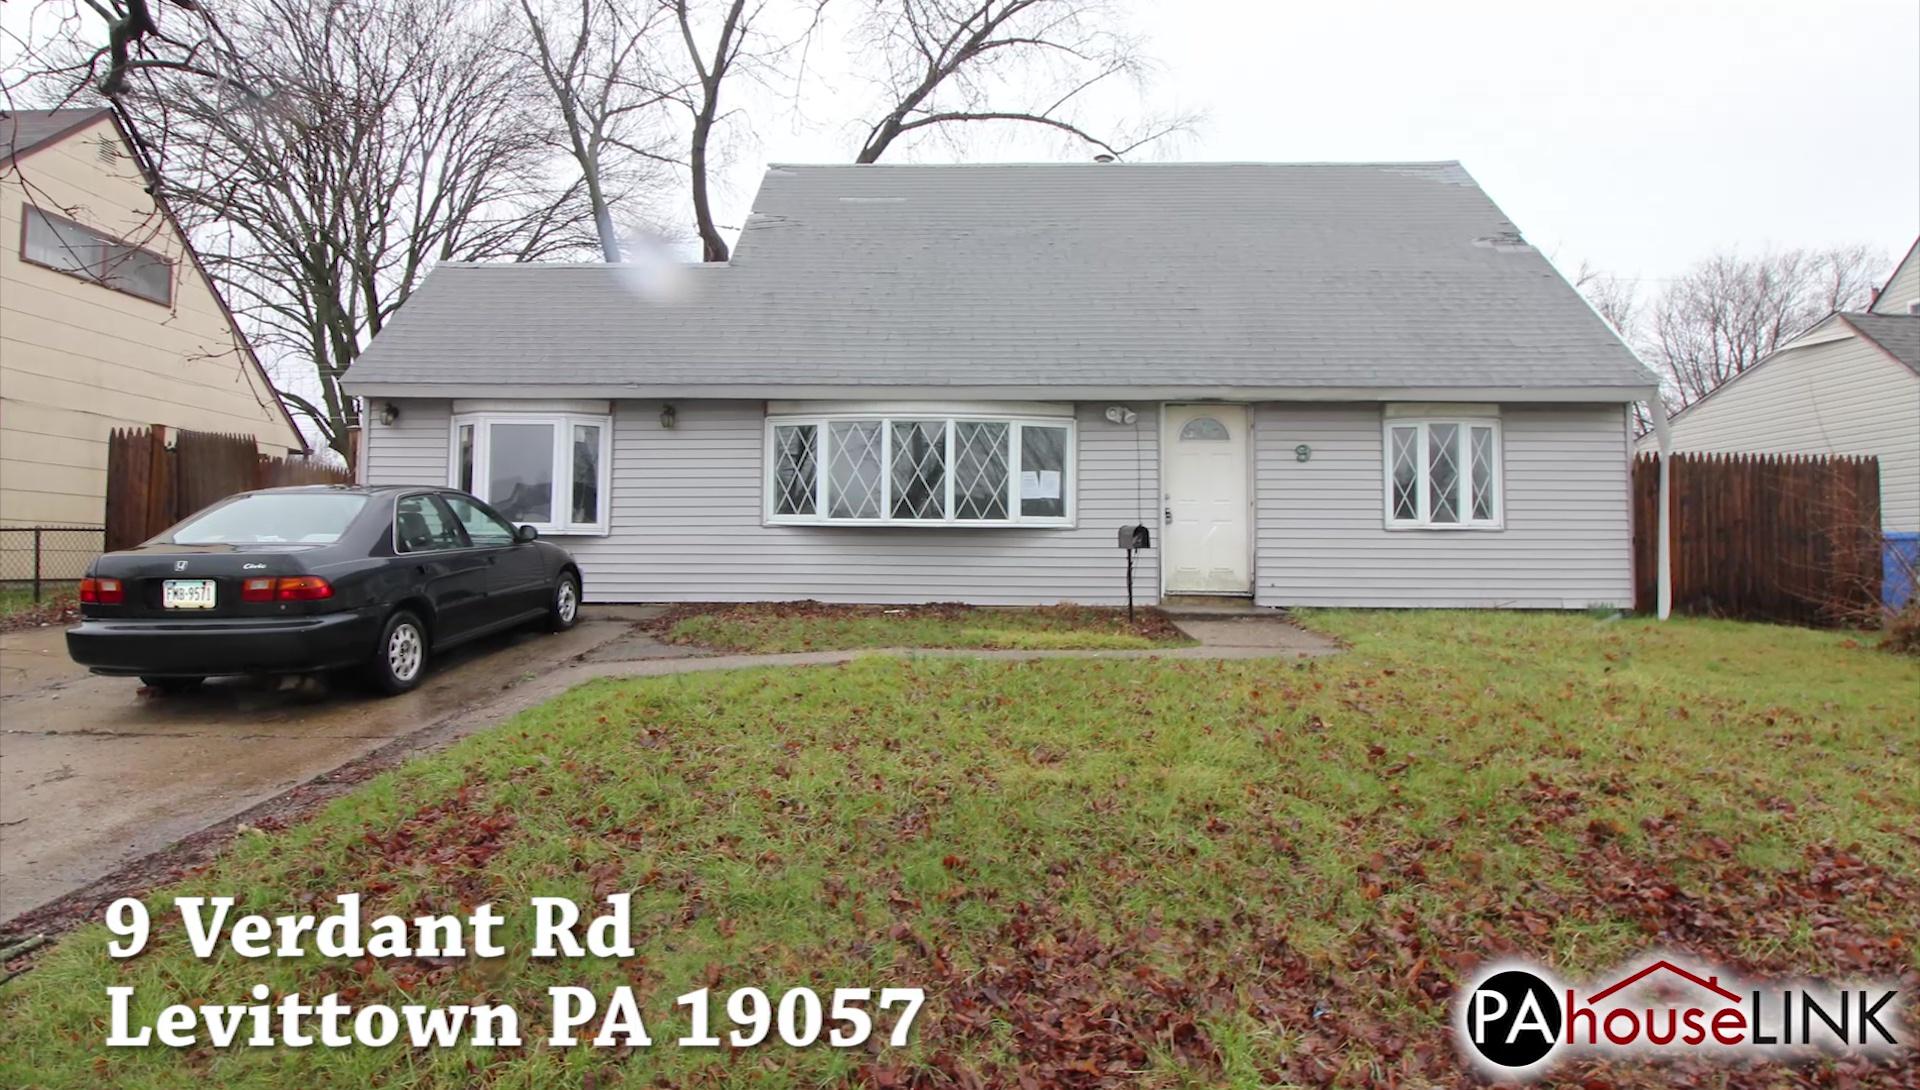 9 Verdant Rd Levittown PA 19057 | Foreclosure Properties Levittown PA 19057